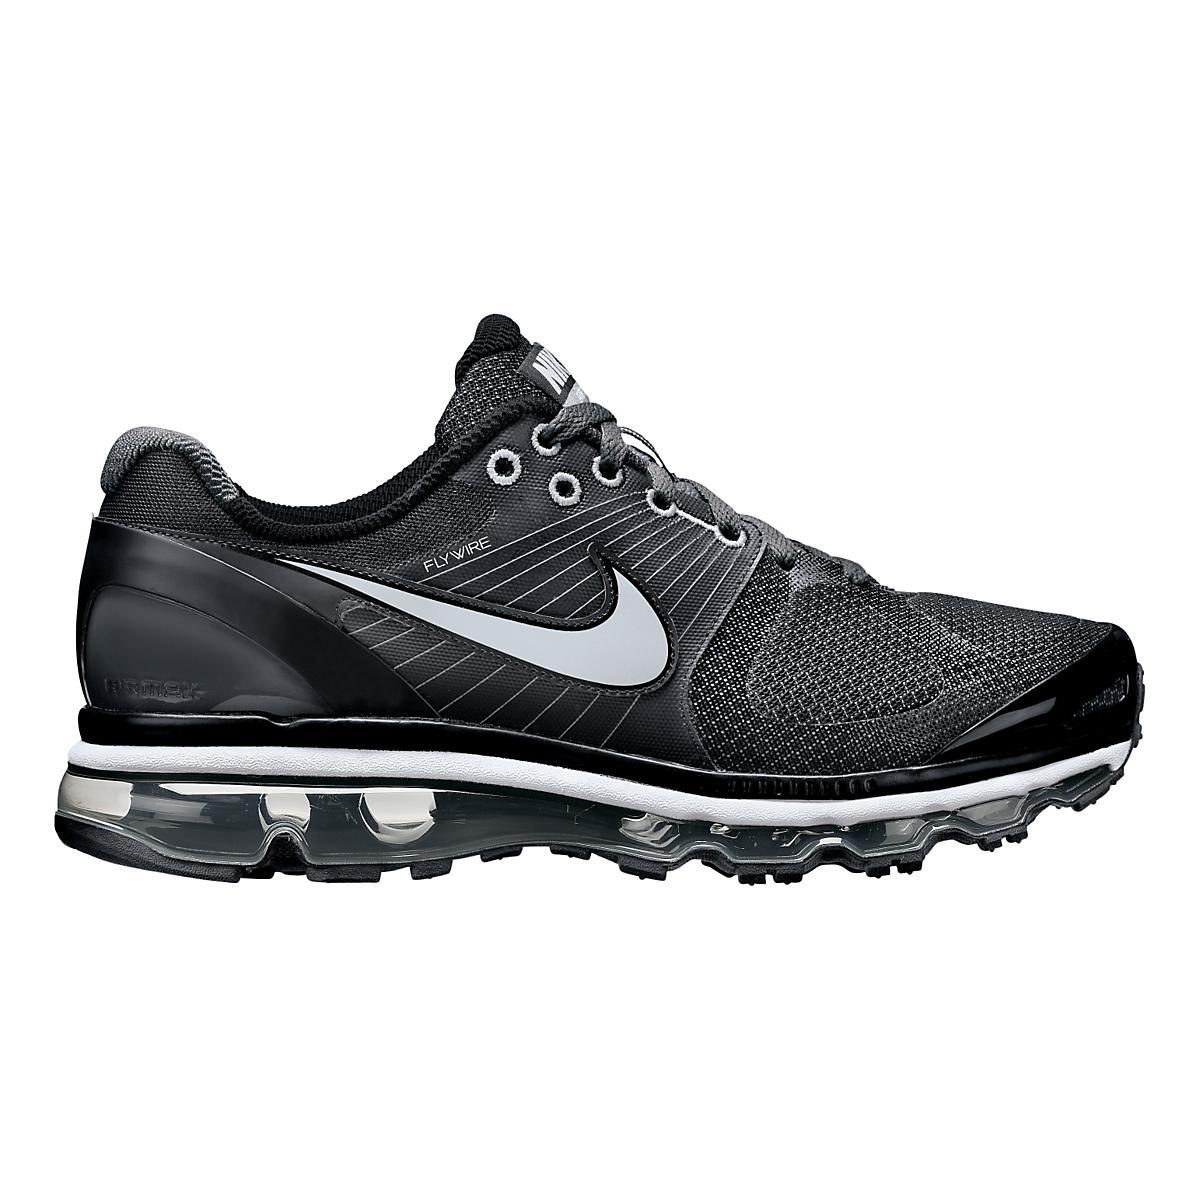 04cc7173395 Mens Nike Air Max+ 2010 Running Shoe at Road Runner Sports